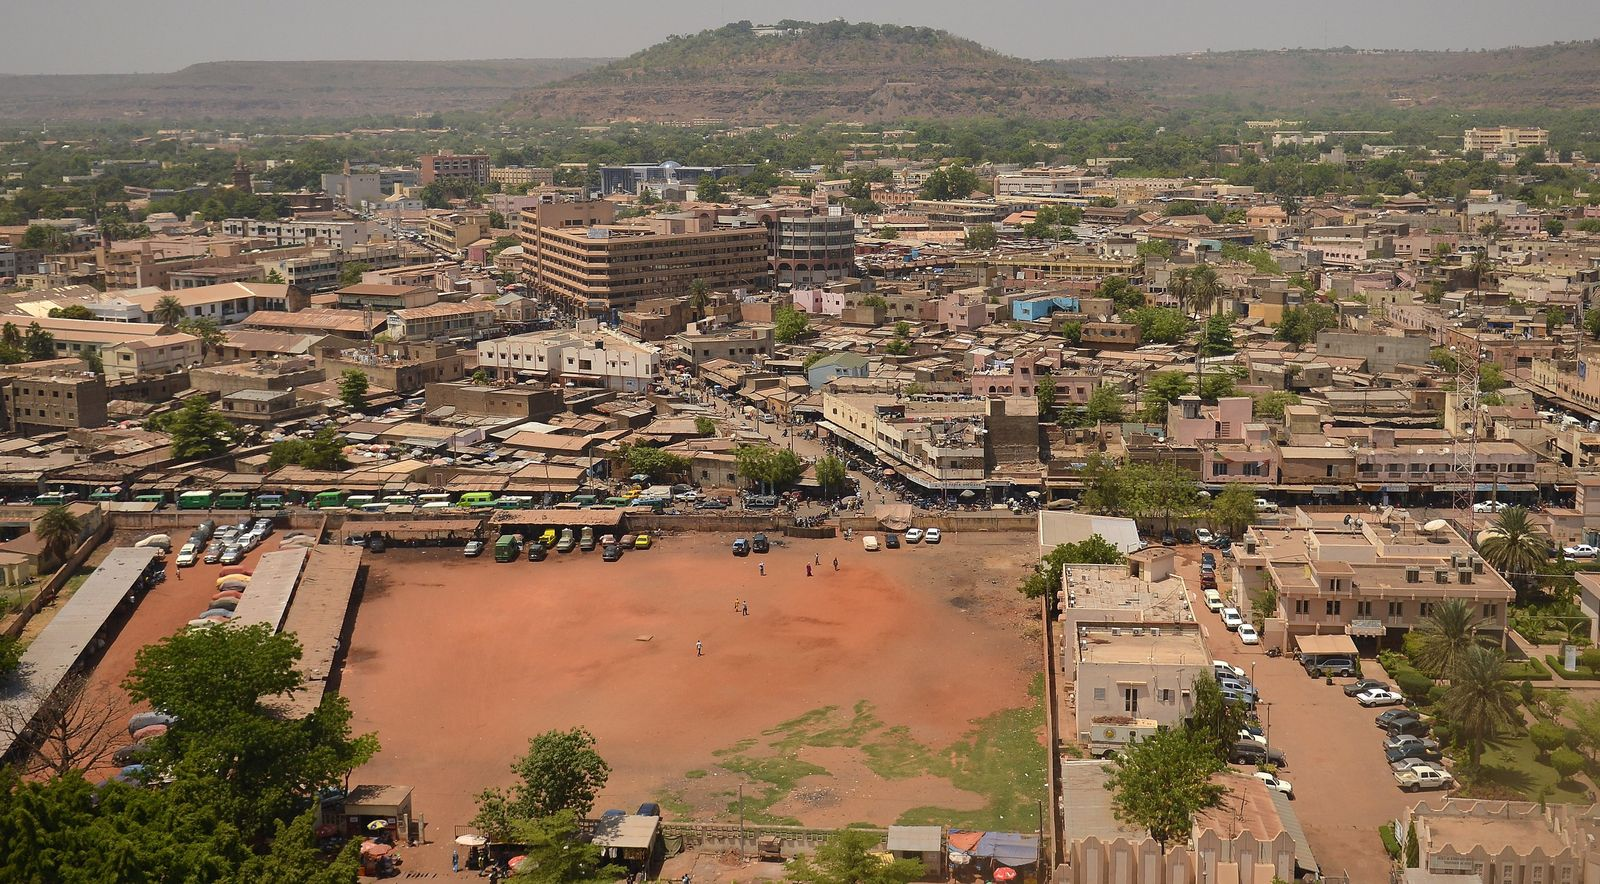 Bamako/ Radisson Hotel/ Geiselnahme Mali